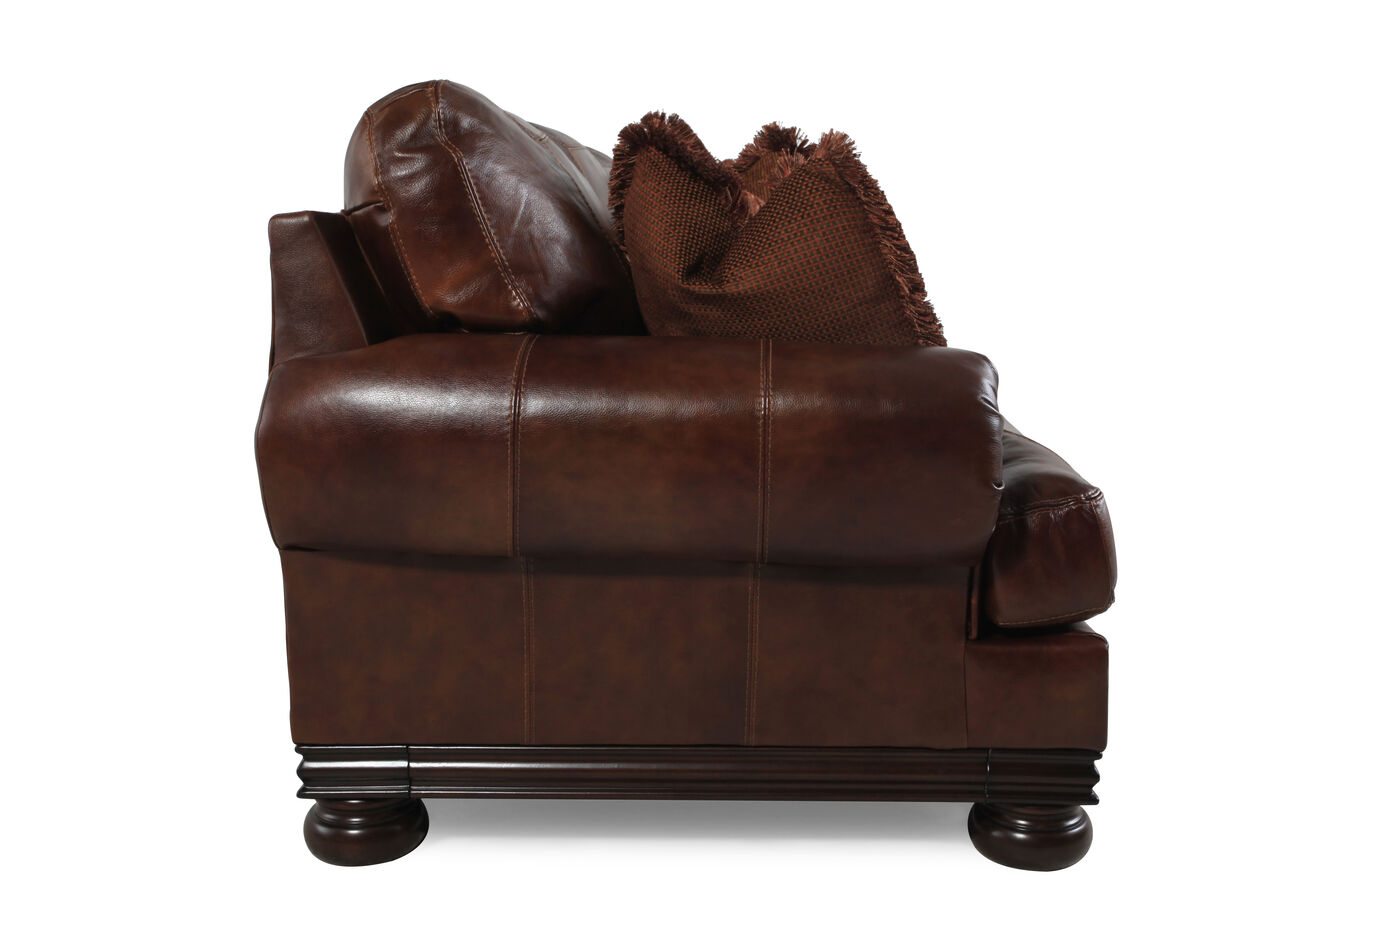 Ashley hutcherson harness sofa